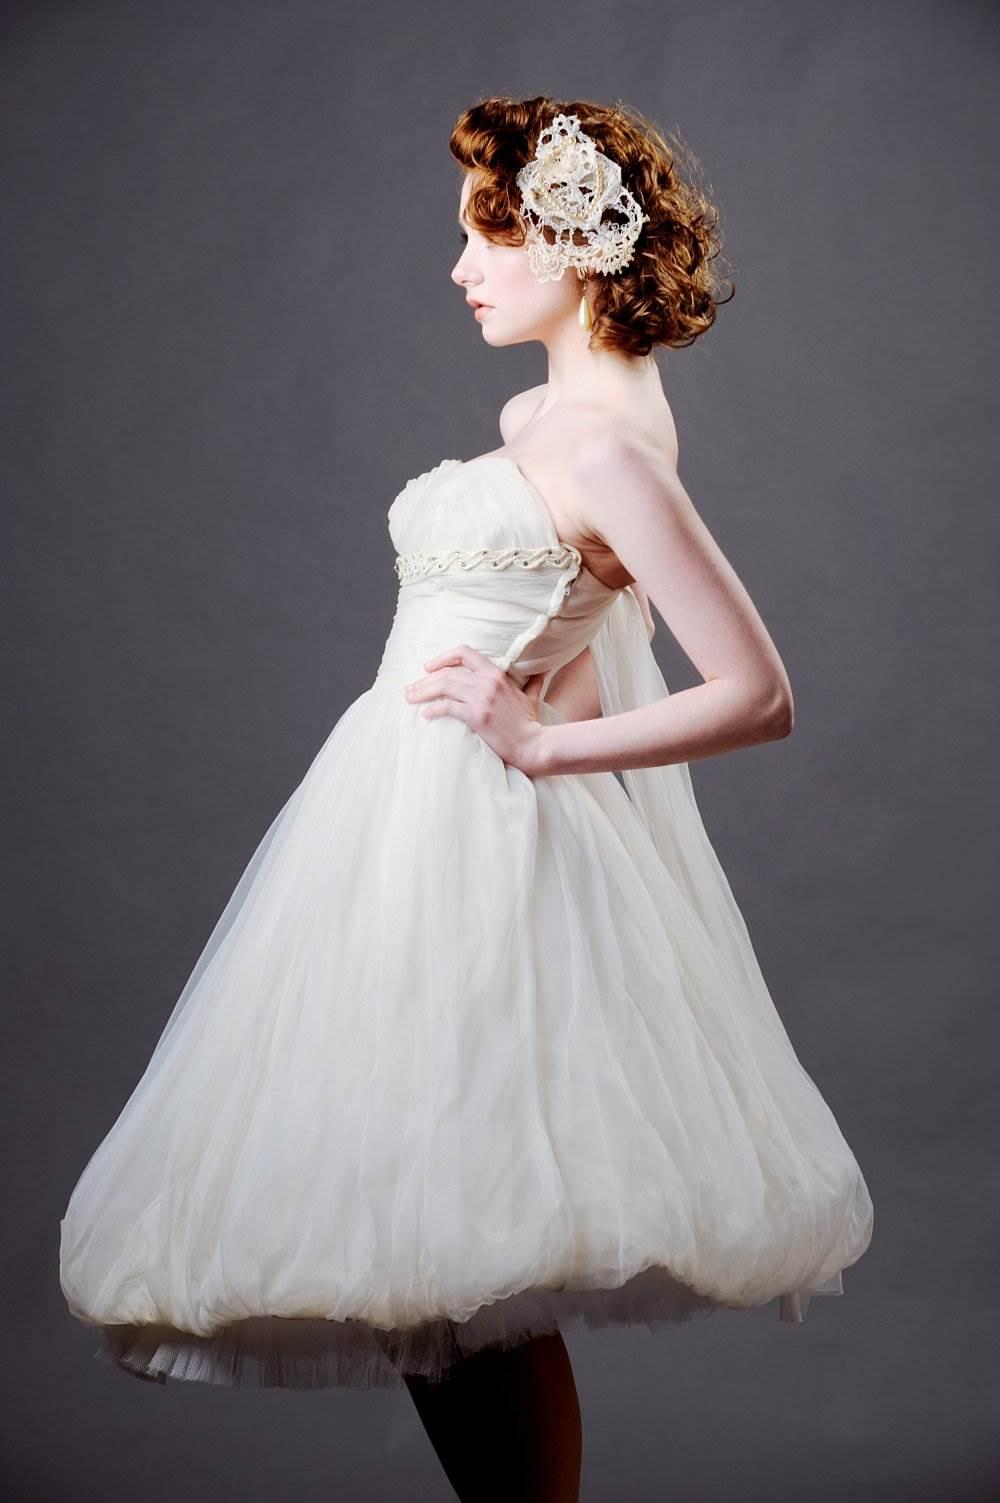 Our original vintage wedding dresses magpie wedding vintage lane vintage wedding dresses at the national vintage wedding fair ombrellifo Gallery